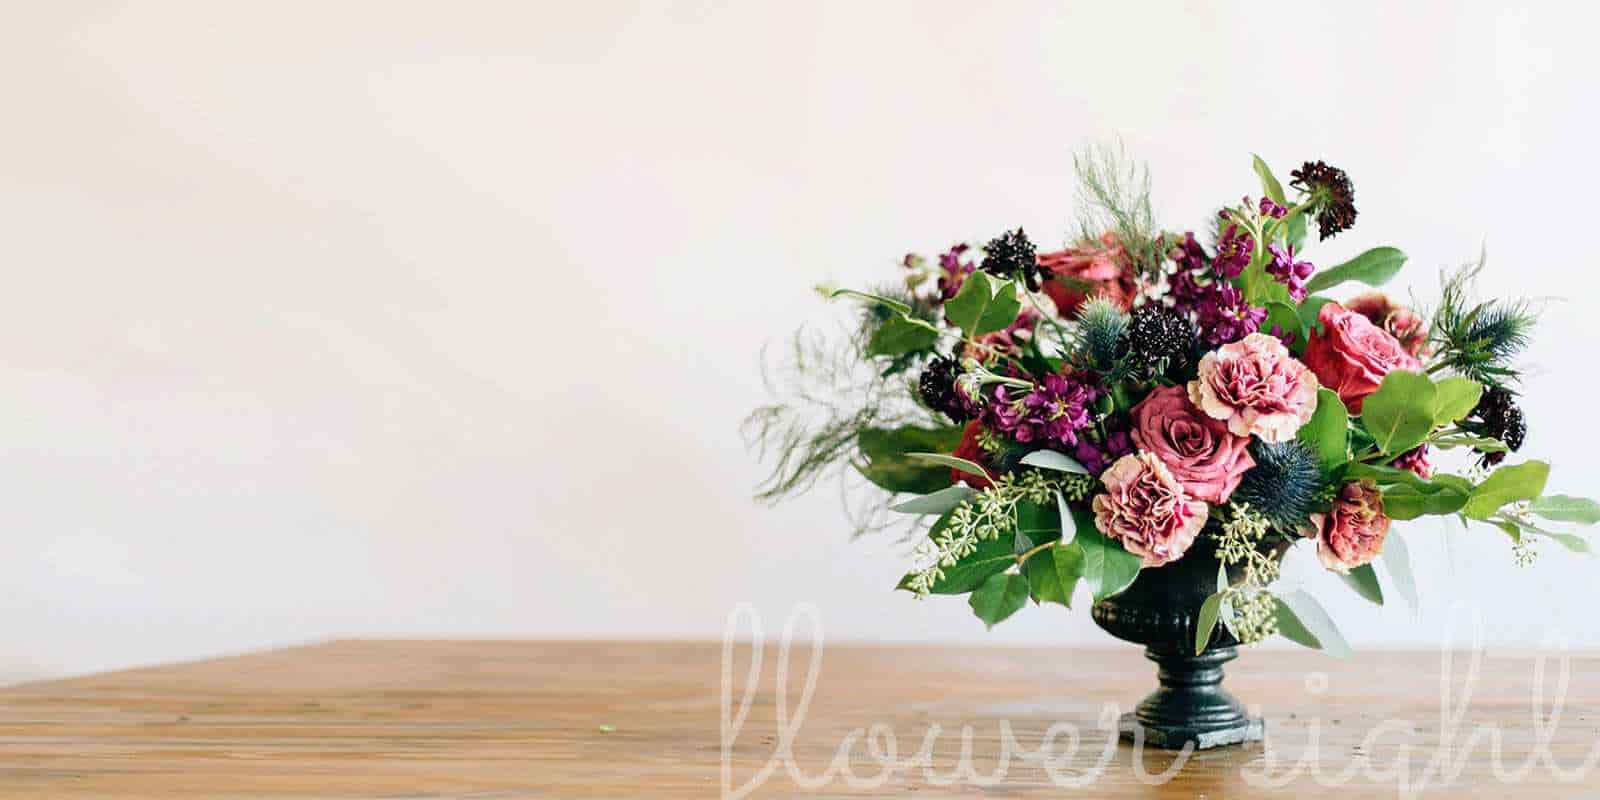 Hoa tặng sinh nhật sếp ý nghĩa